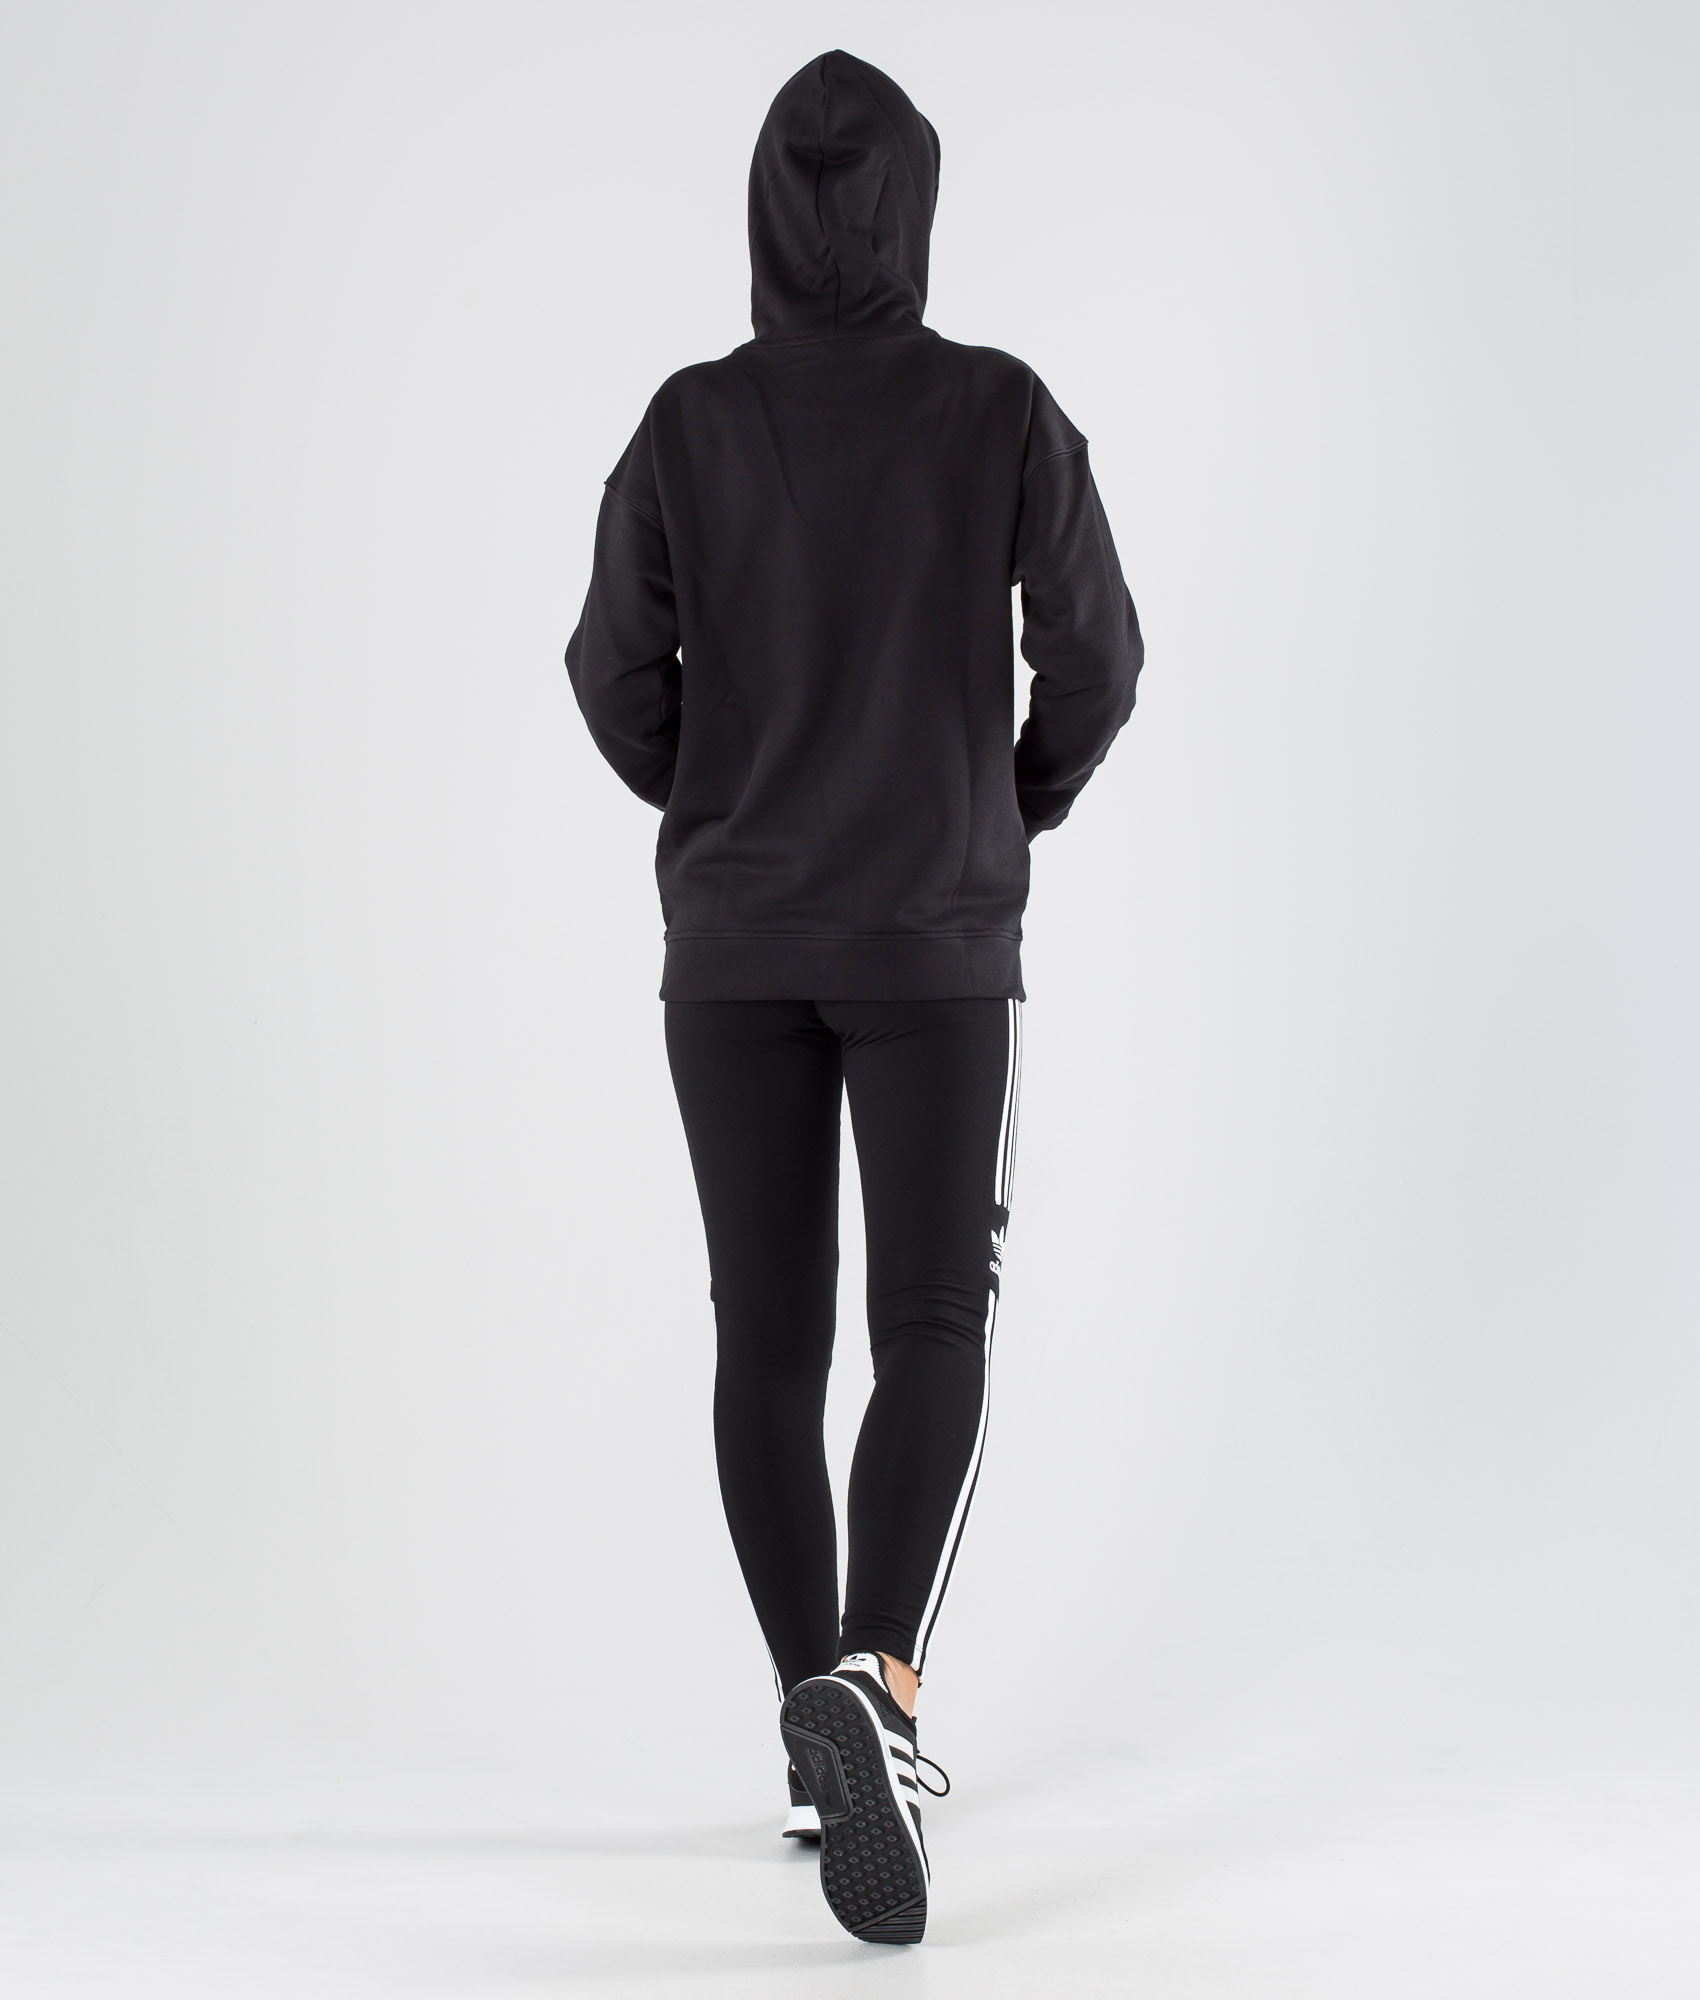 Adidas Originals Trefoil Hoodie Hood BlackWhite